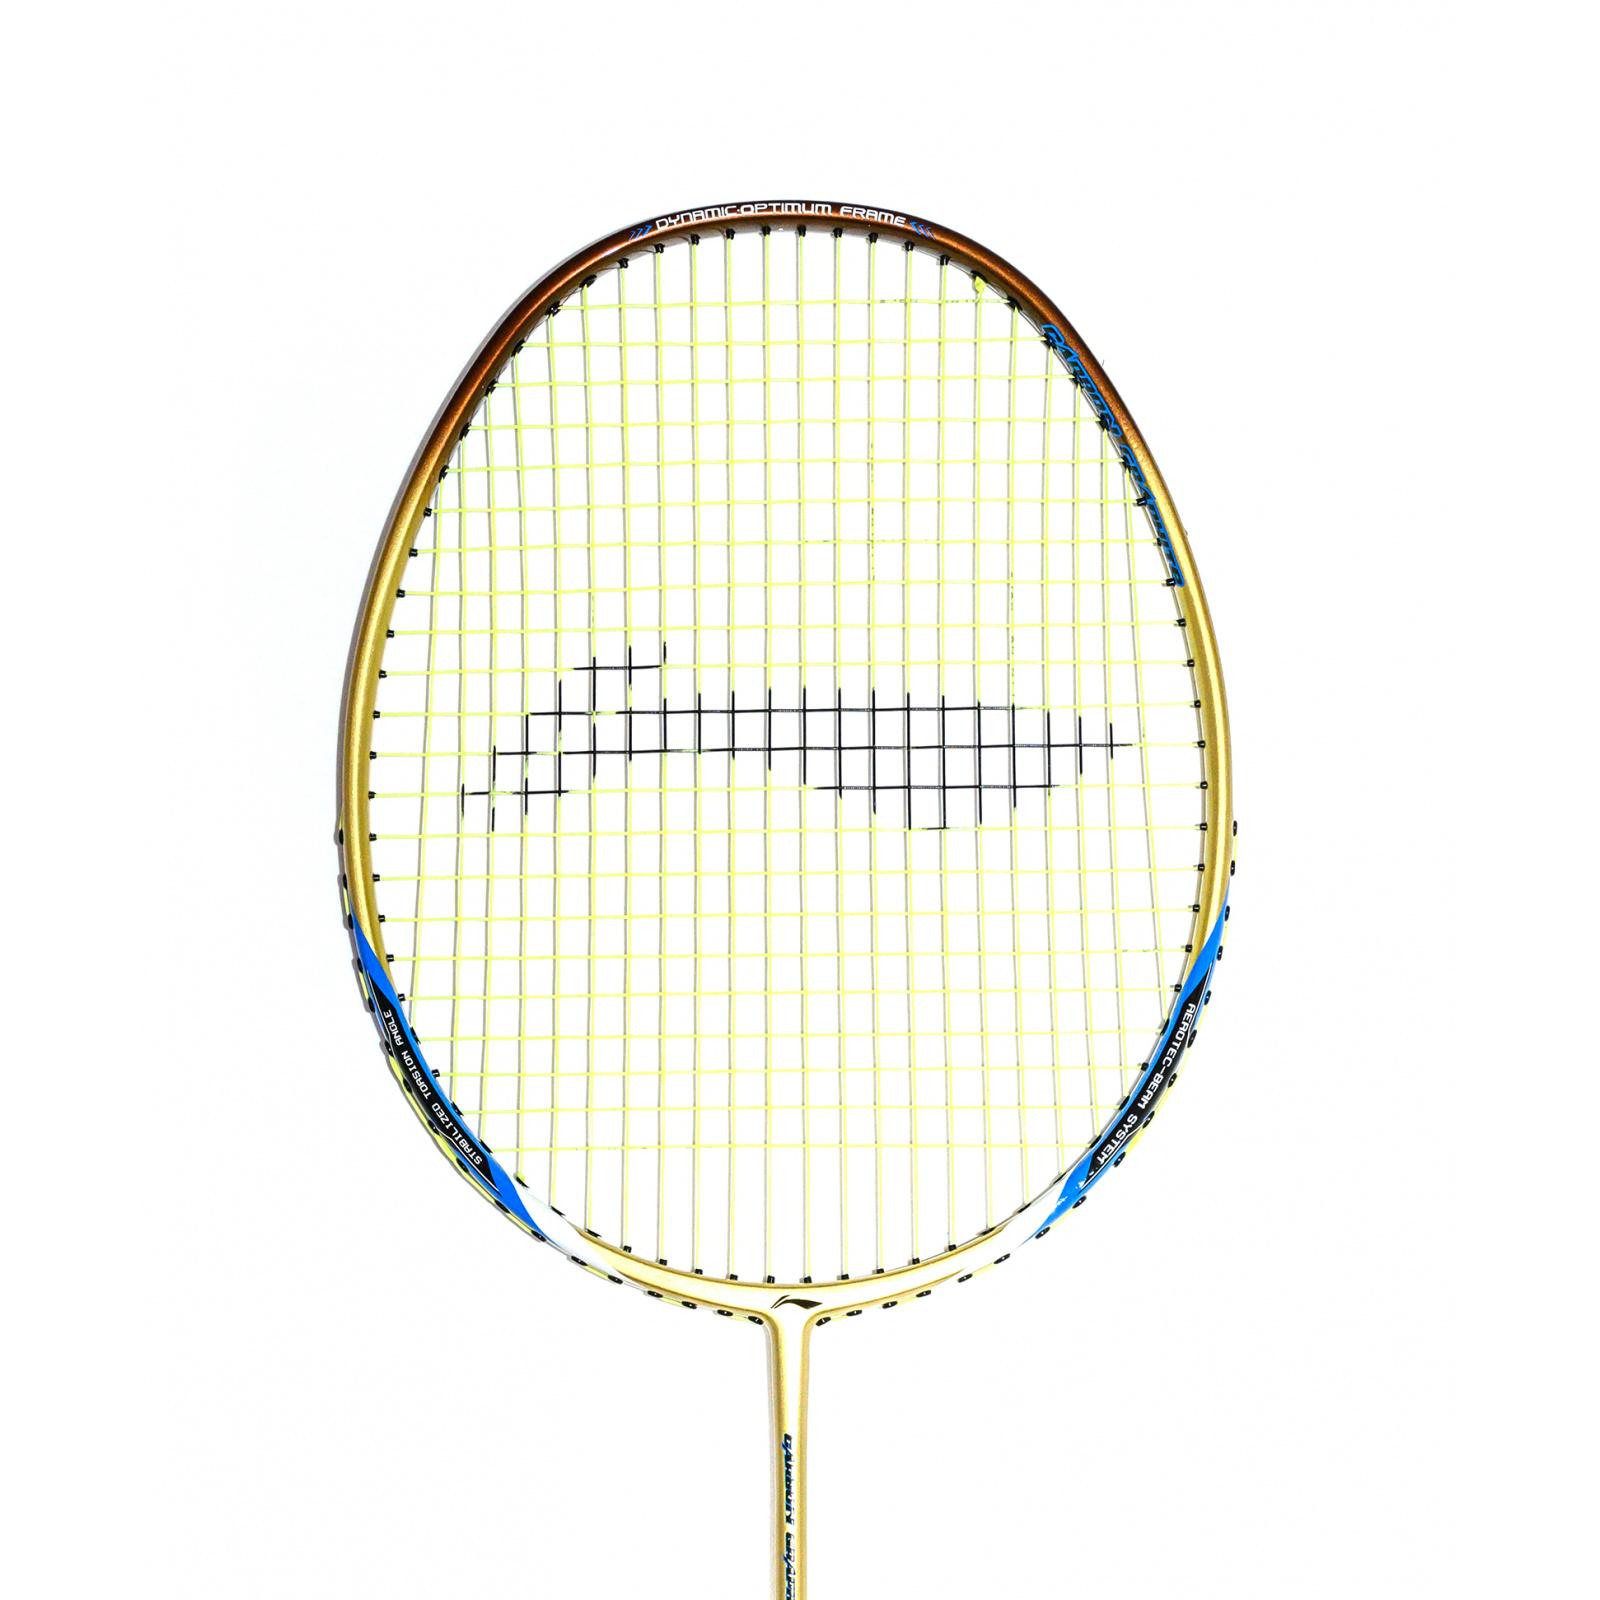 https://www.badec.store/produkty_img/badmintonova-raketa1570562410L.jpg